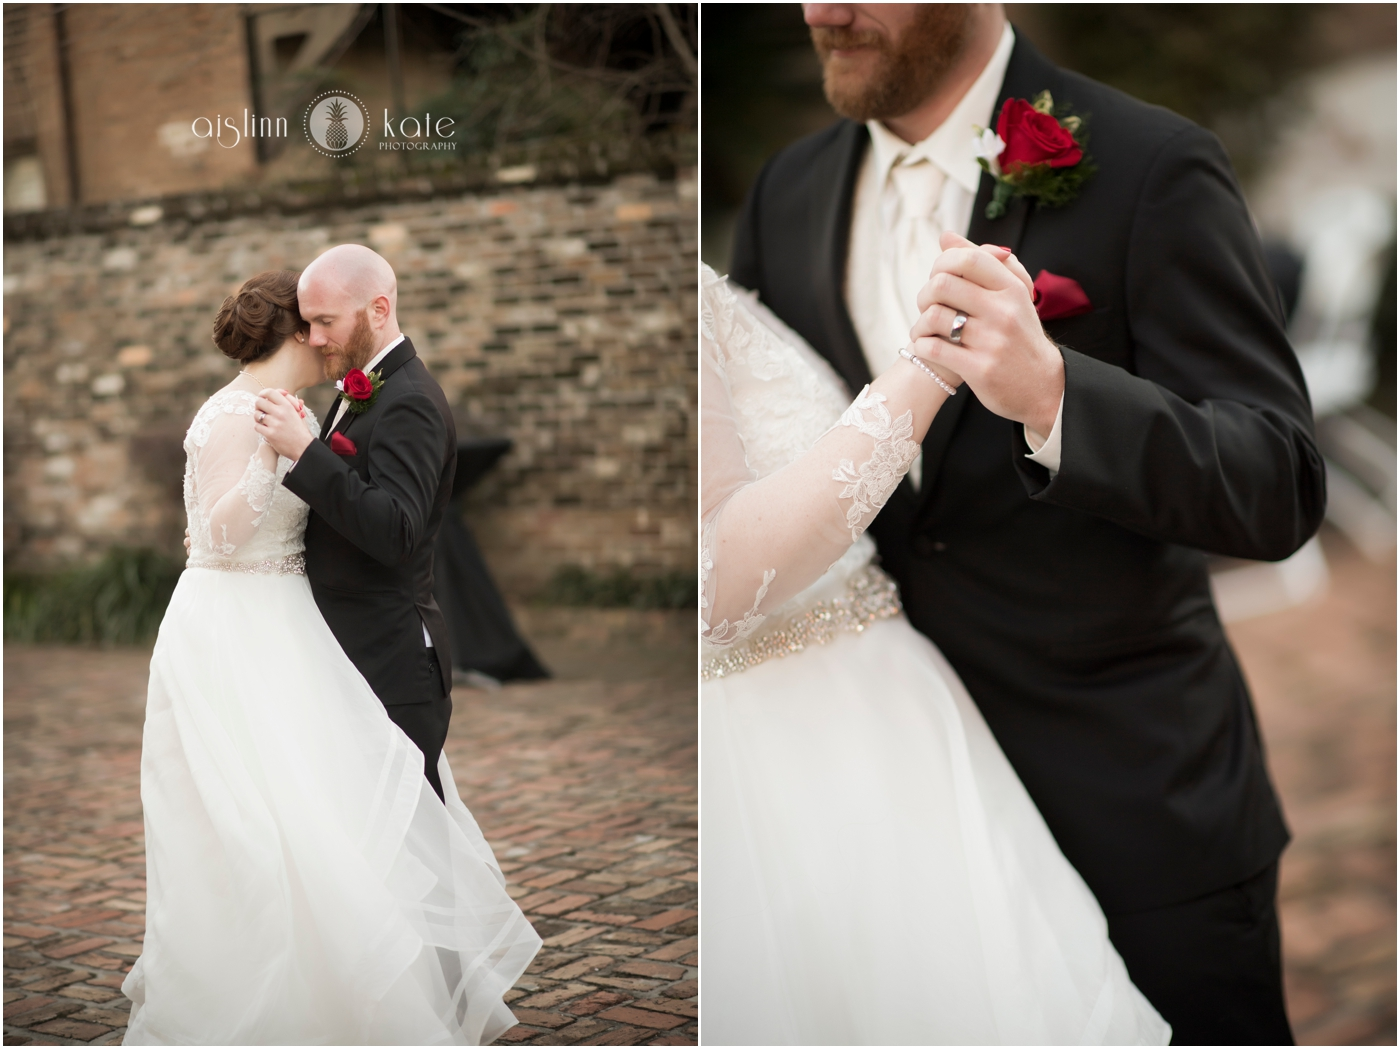 Pensacola-Destin-Wedding-Photographer_0233.jpg